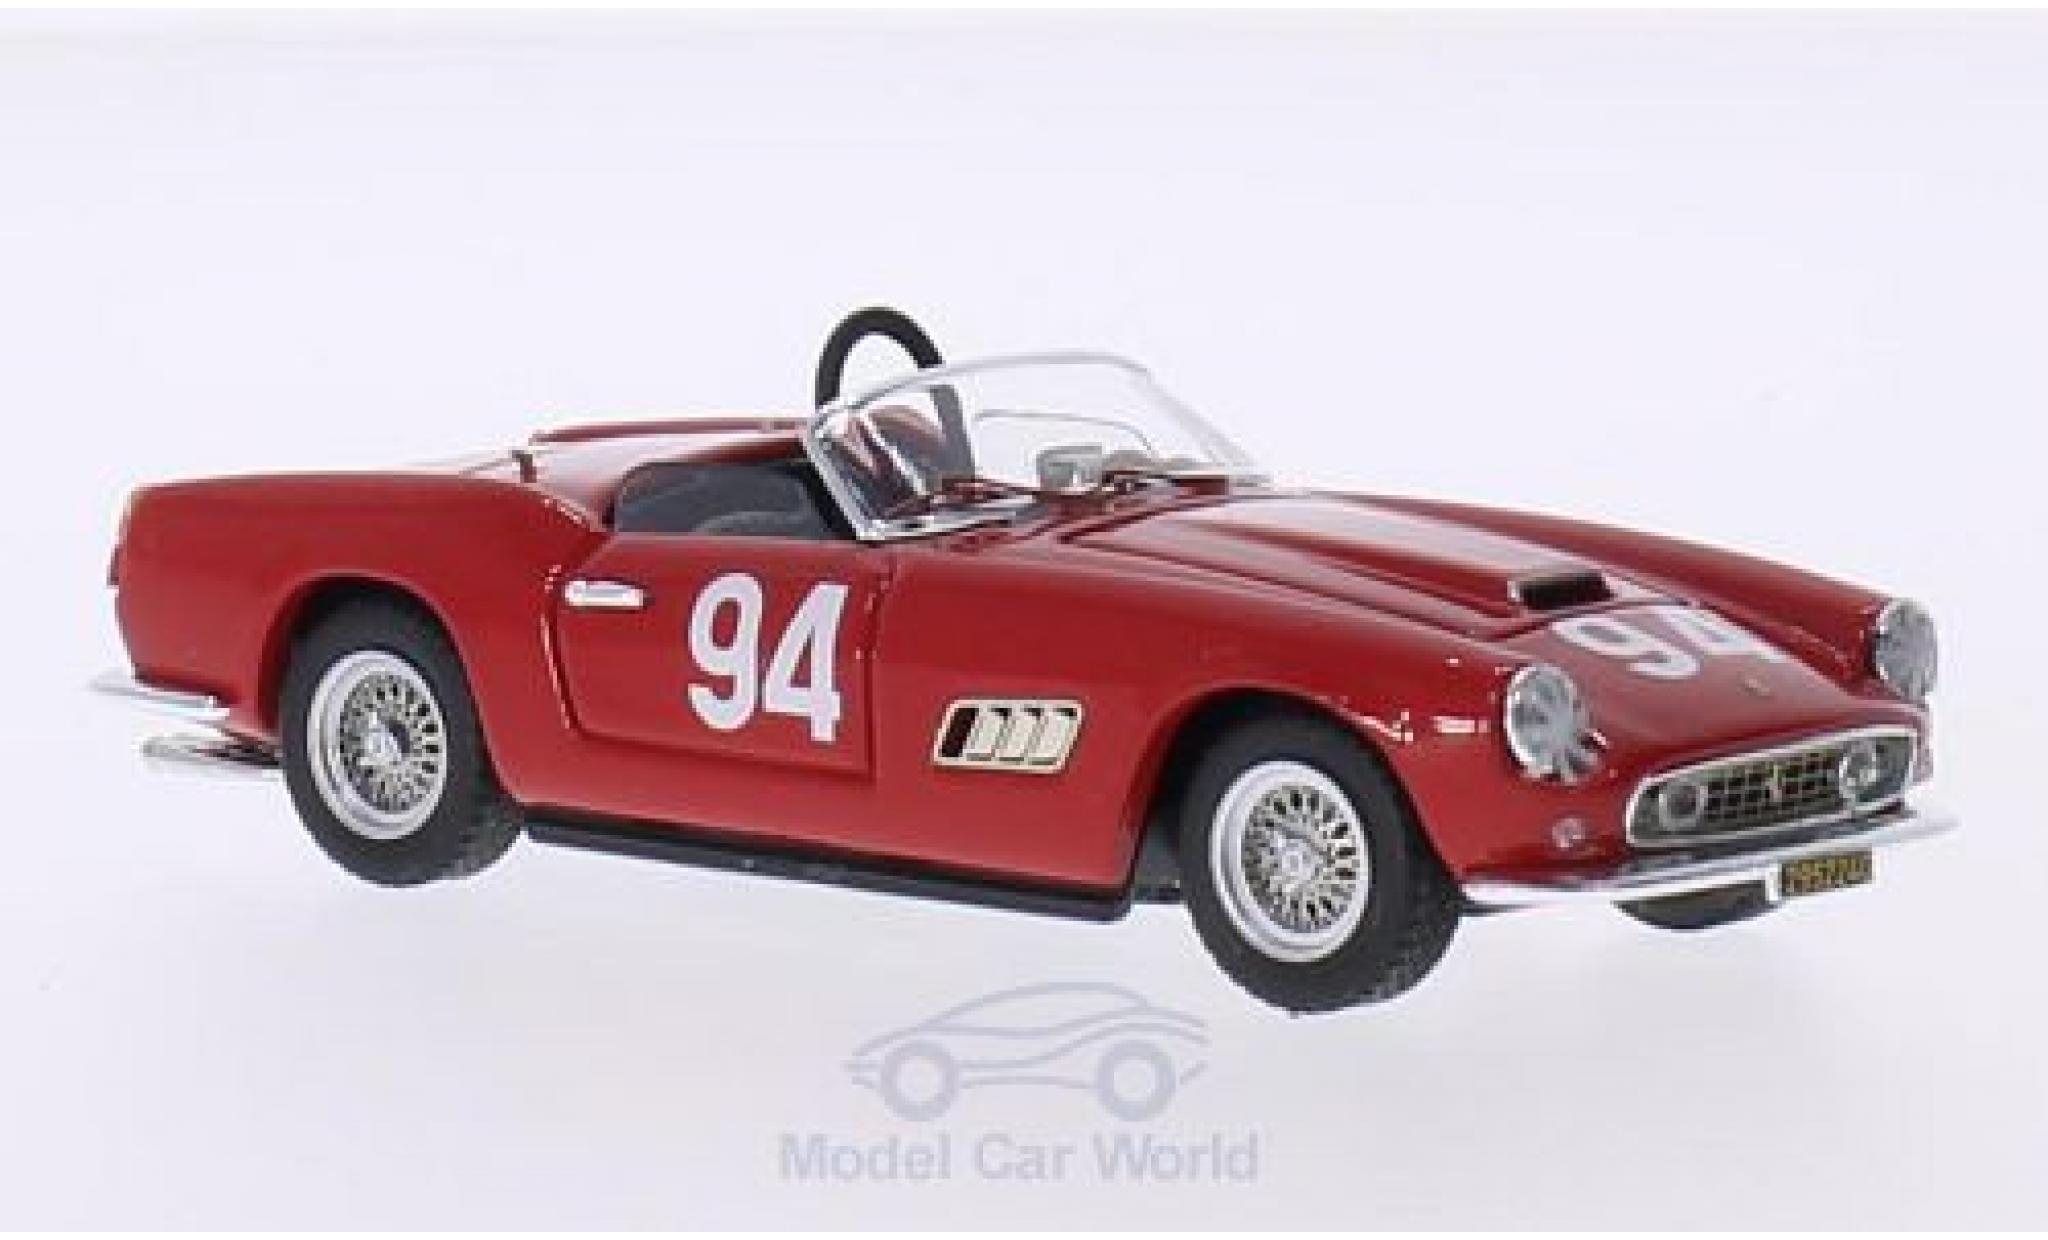 Ferrari 250 1/43 Art Model California rouge No.94 Nassau 1959 W.Burnett